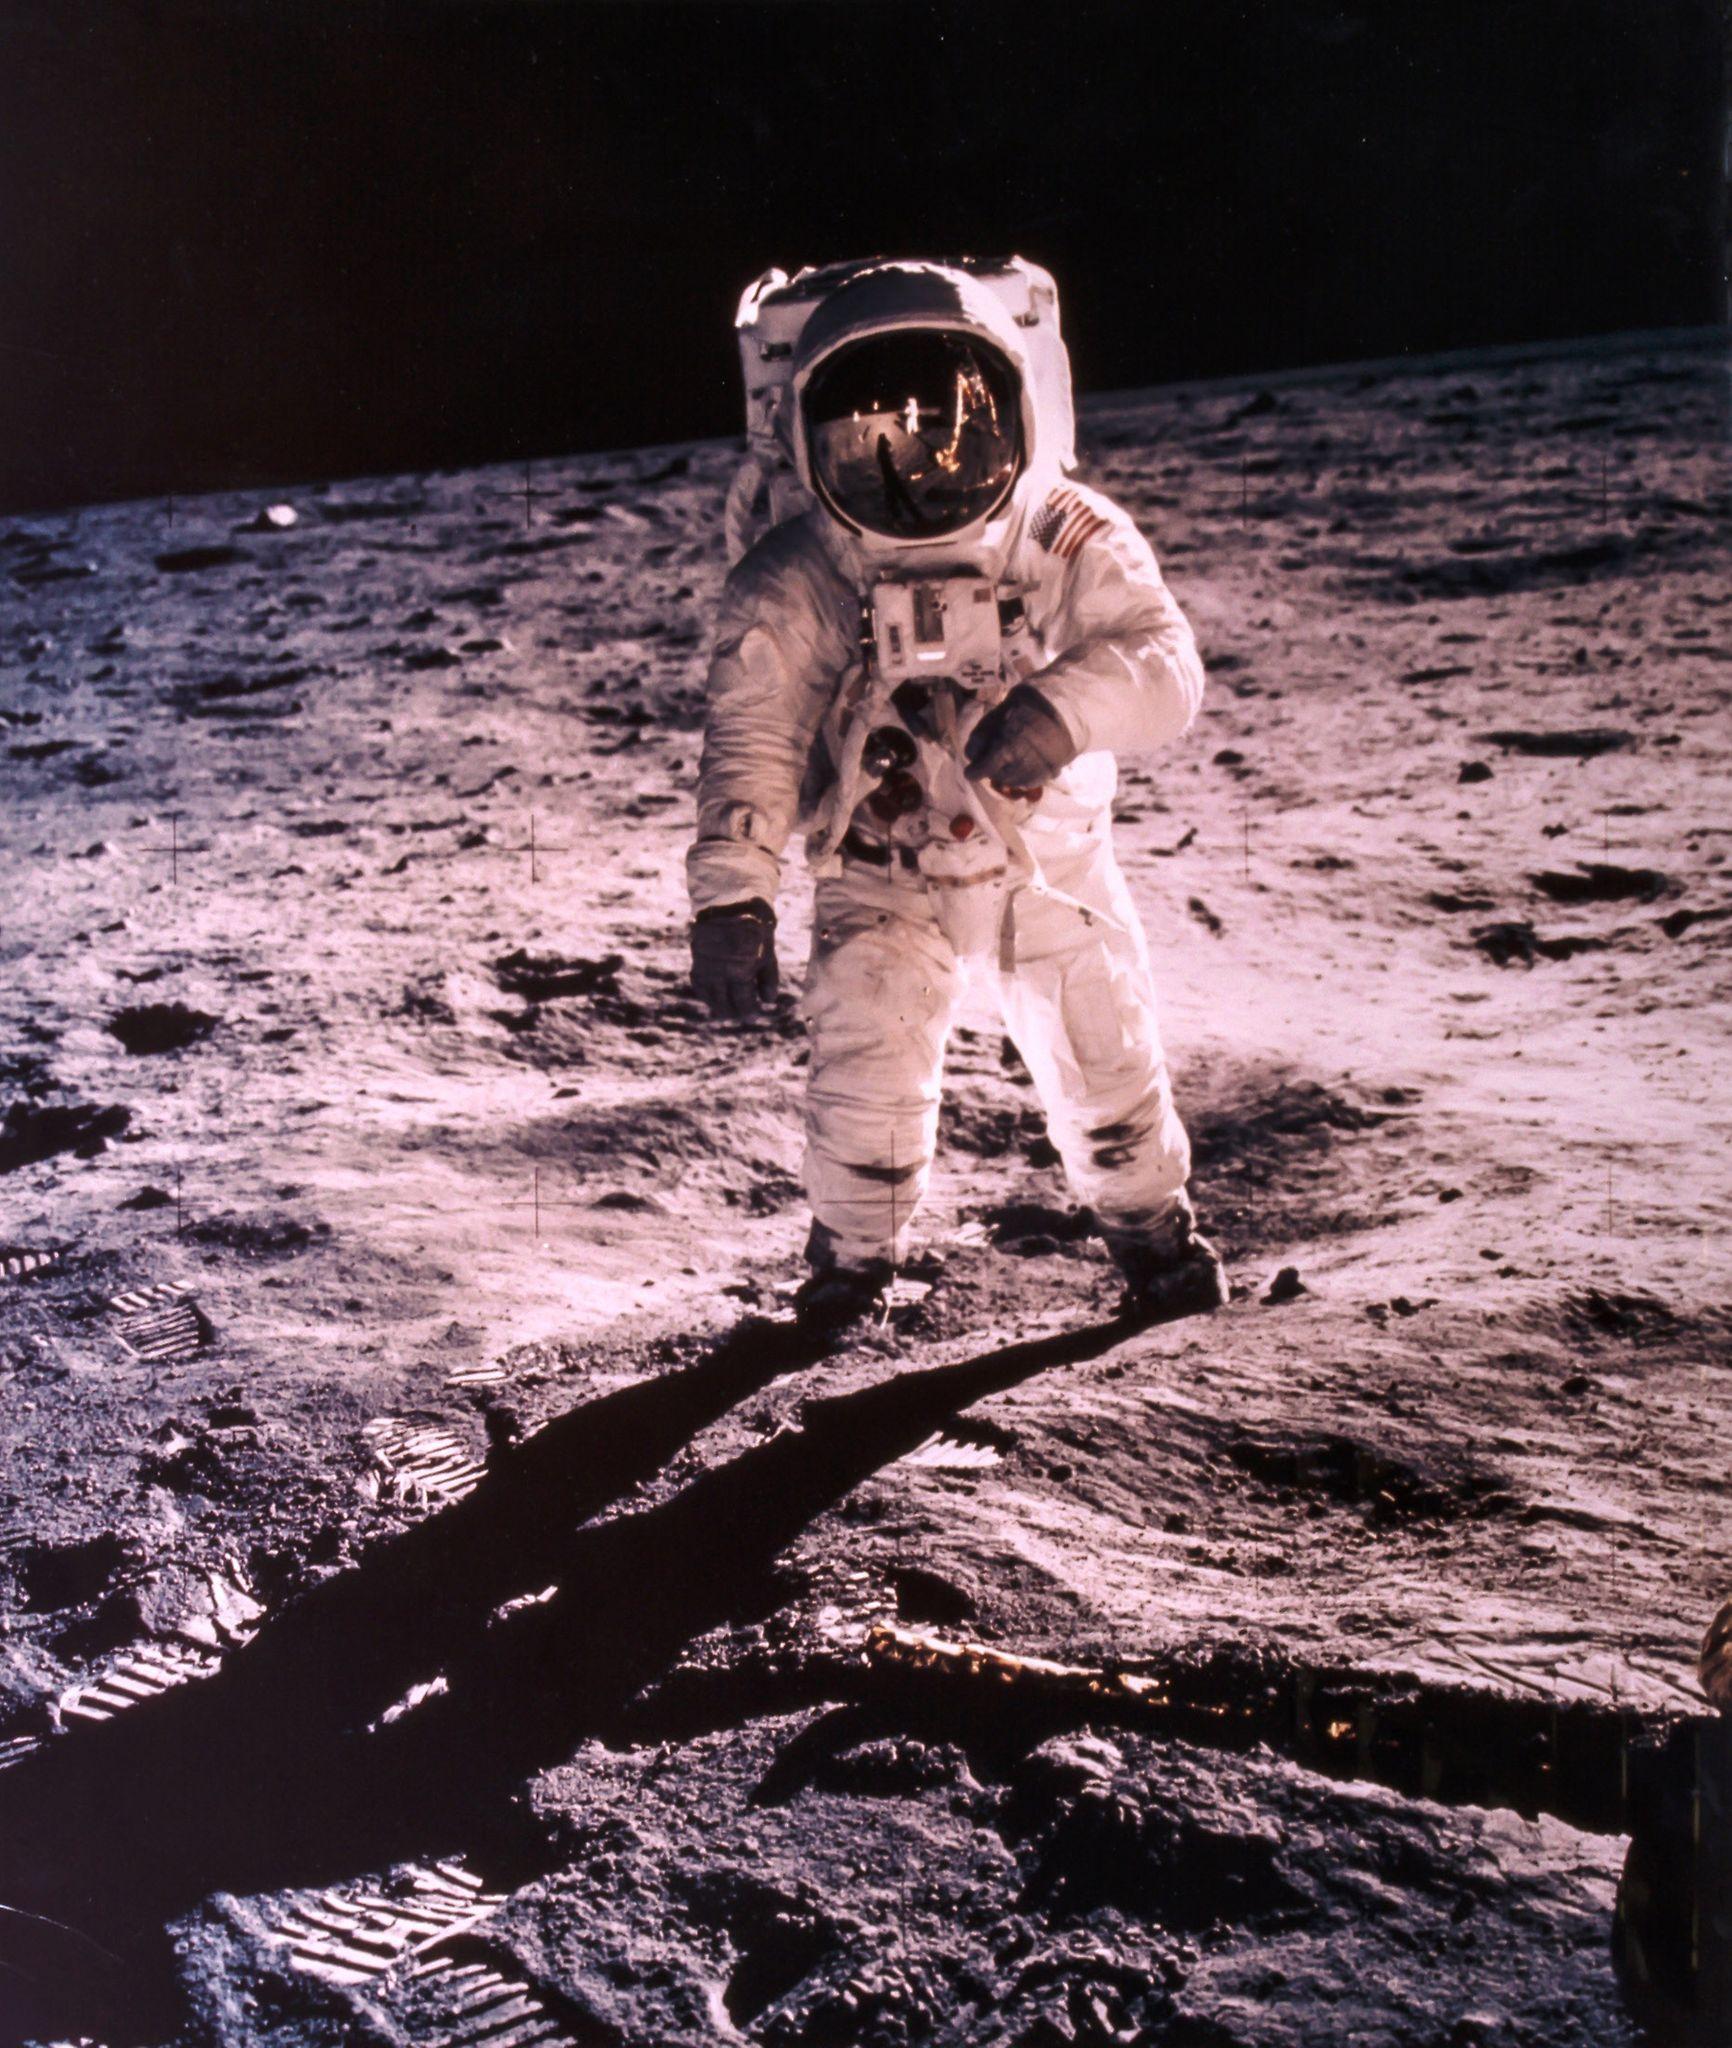 Portrait of Buzz Aldrin